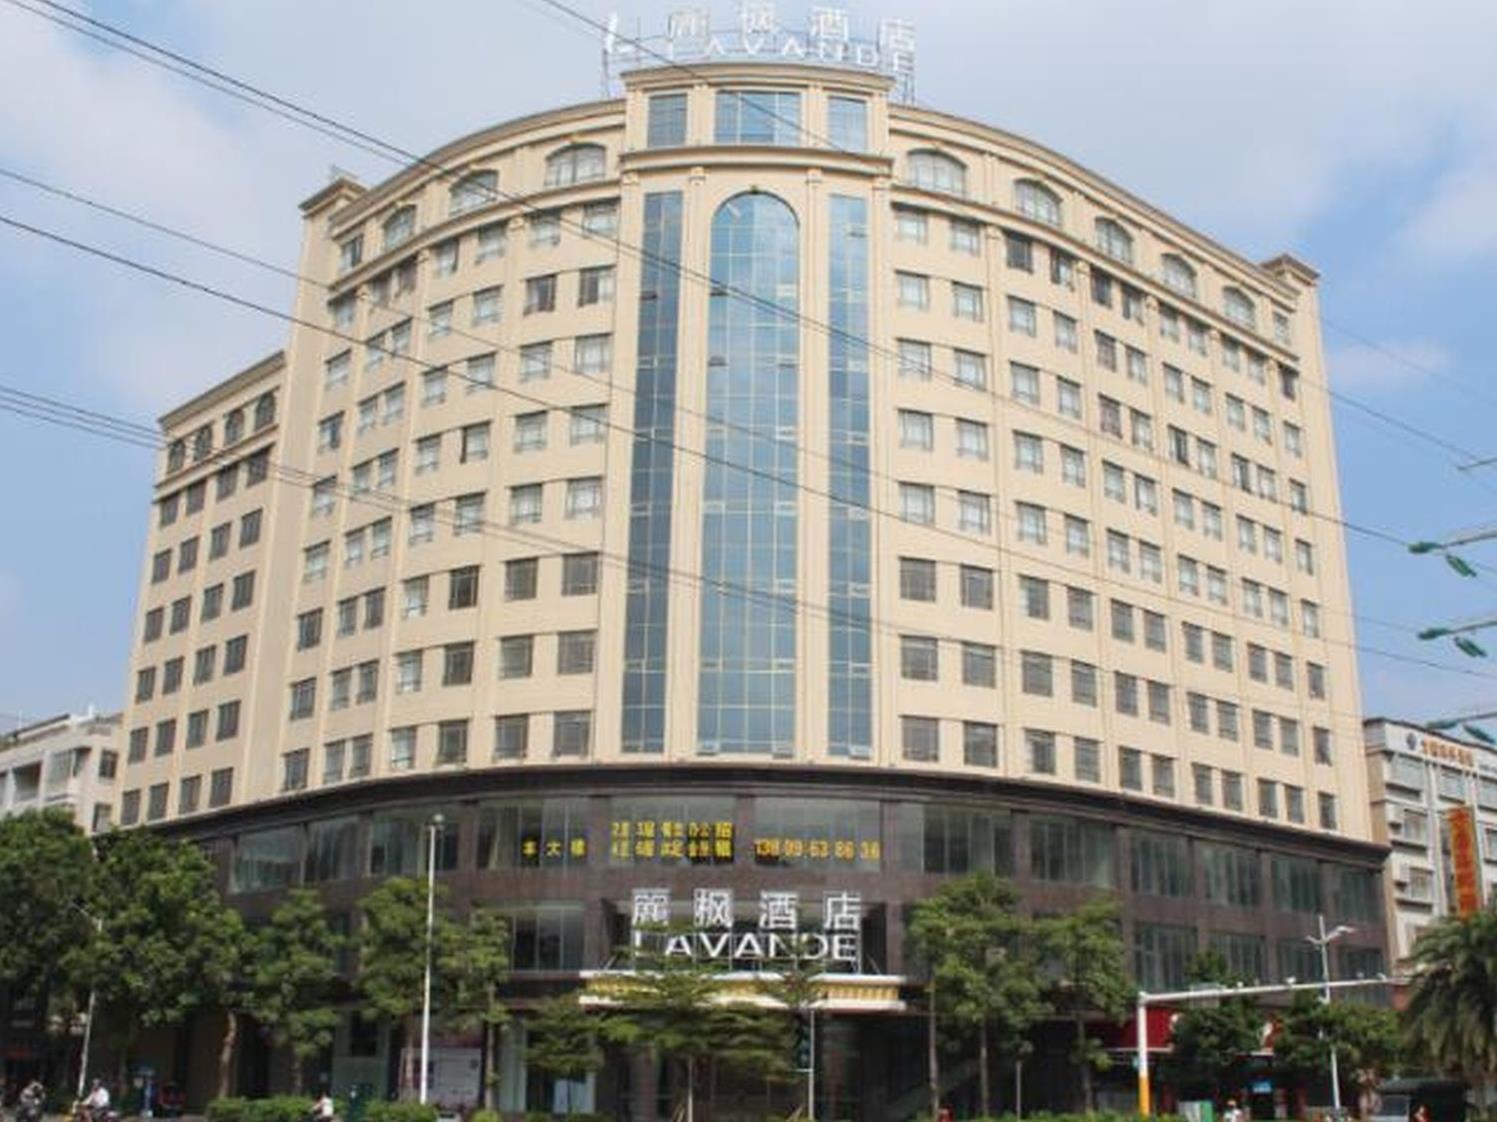 Lavande Hotel Yangjiang Xiping Road Wal-Mart Branch, Yangjiang